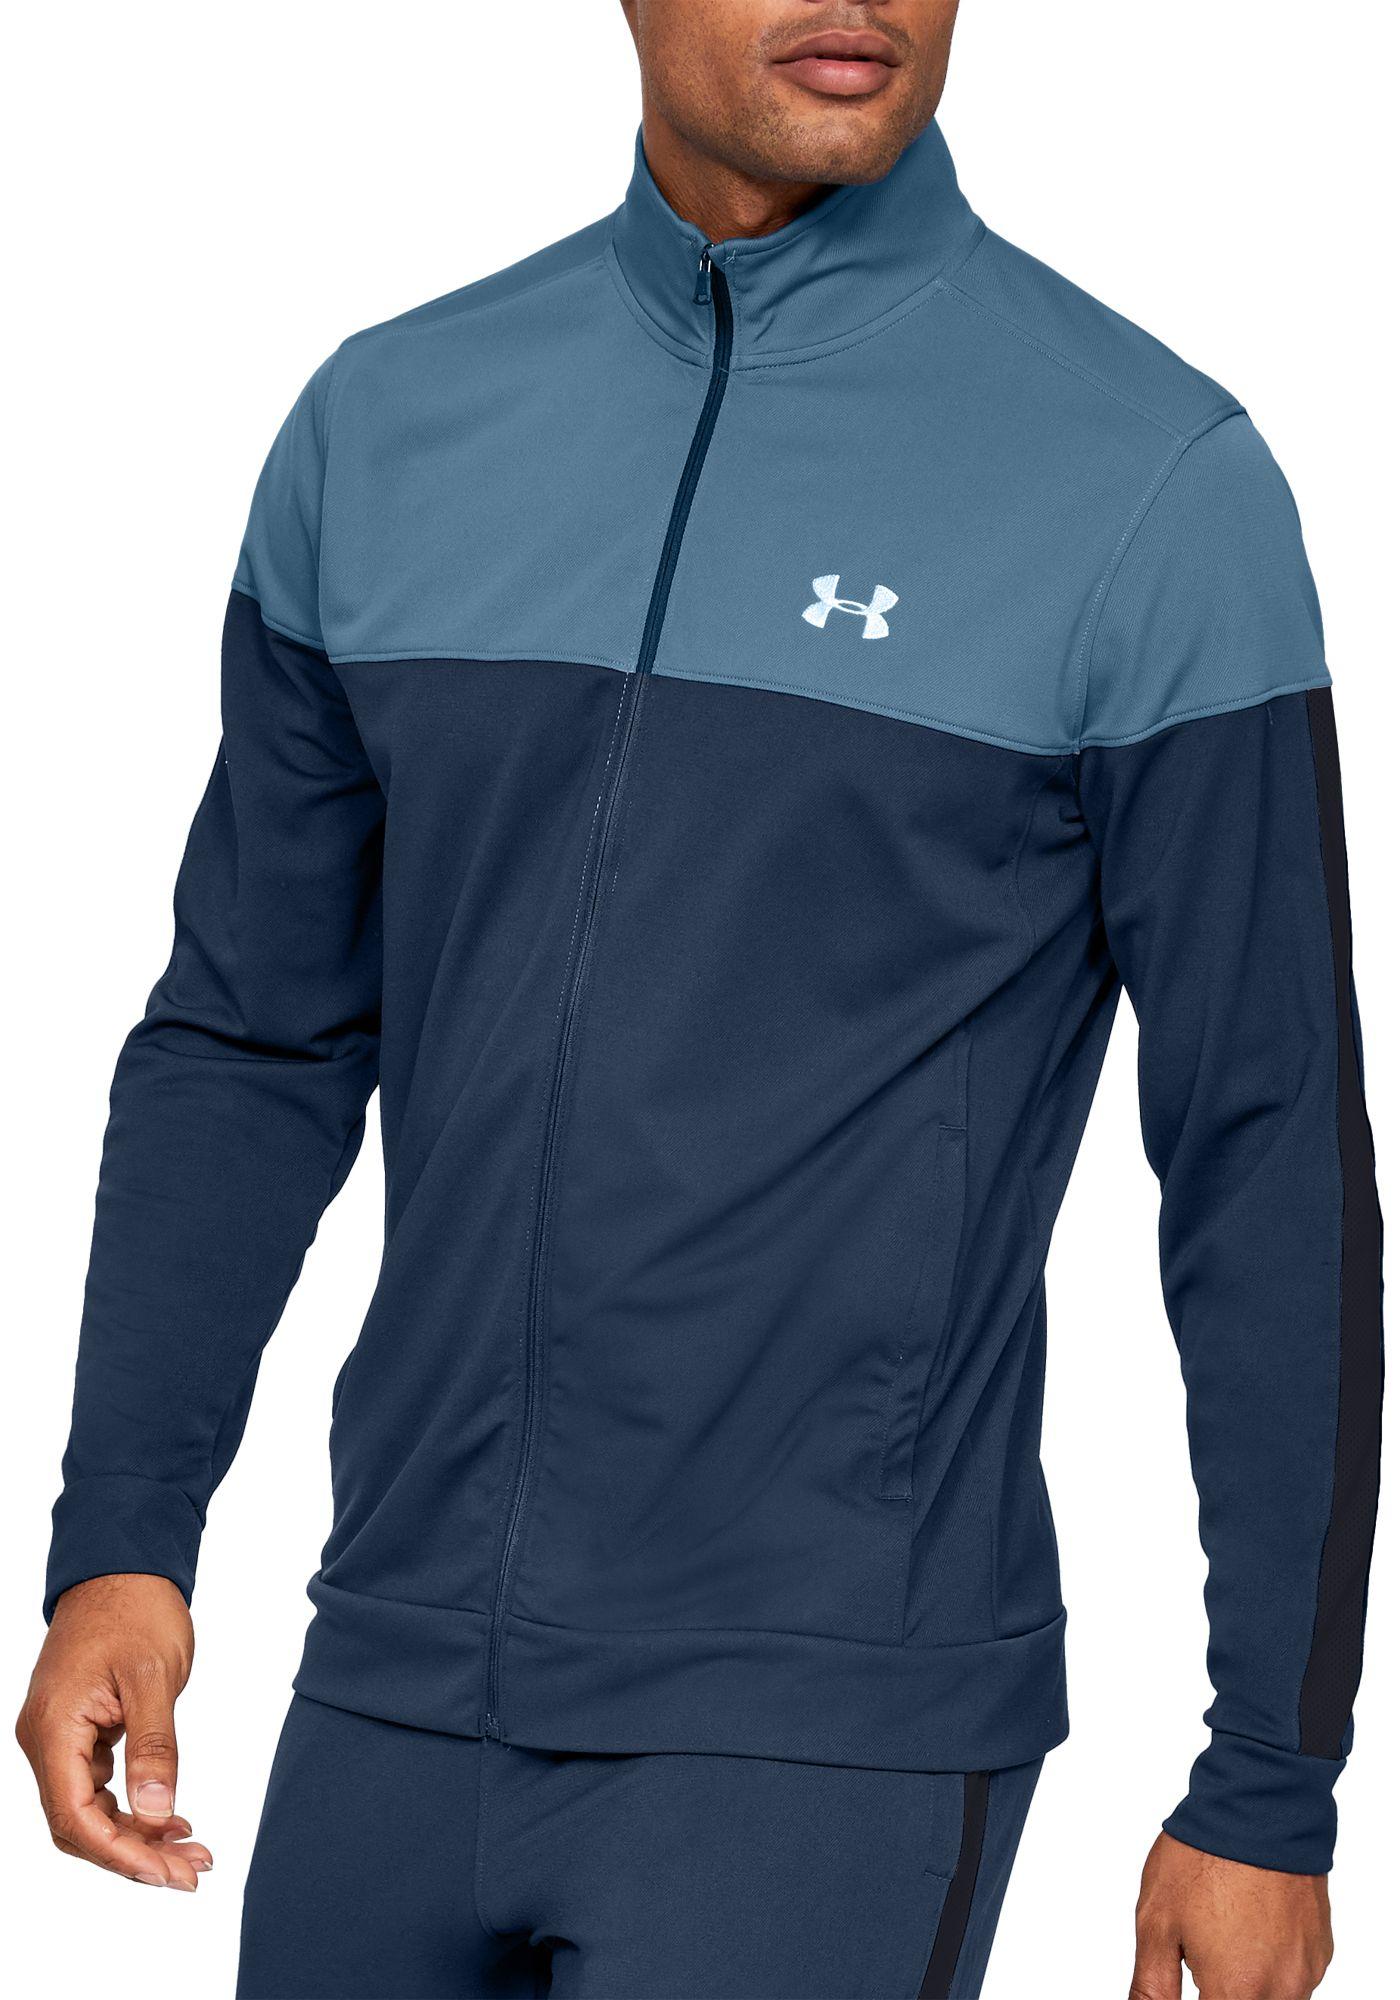 Under Armour Men's Sportstyle Pique' Full-Zip Jacket